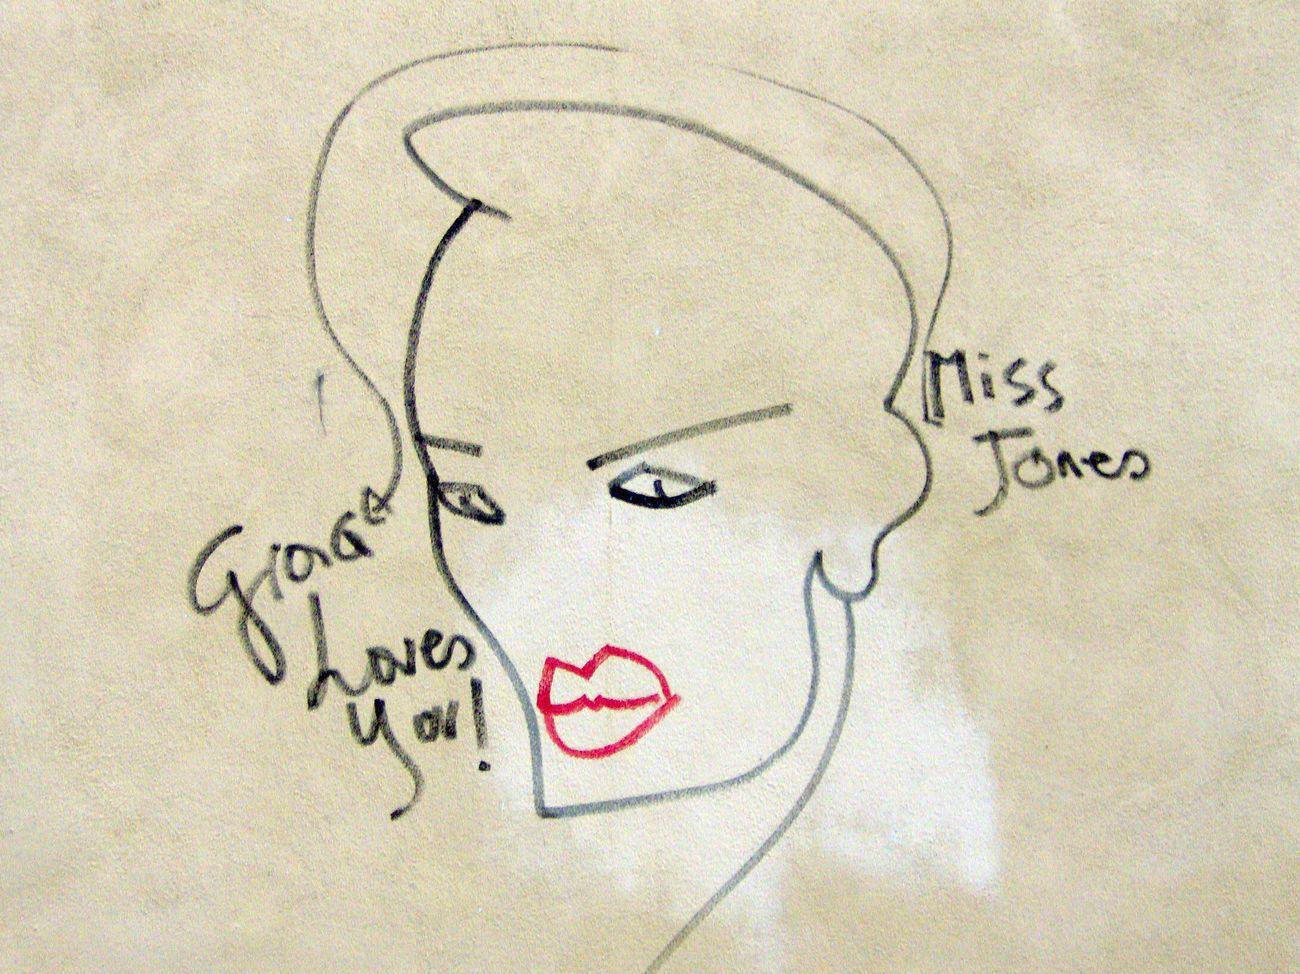 Grace. Drawing - Art Product Art And Craft Drawn No People Close-up Handwriting  Day Venice Grace Jones Architecture Wall Graffiti